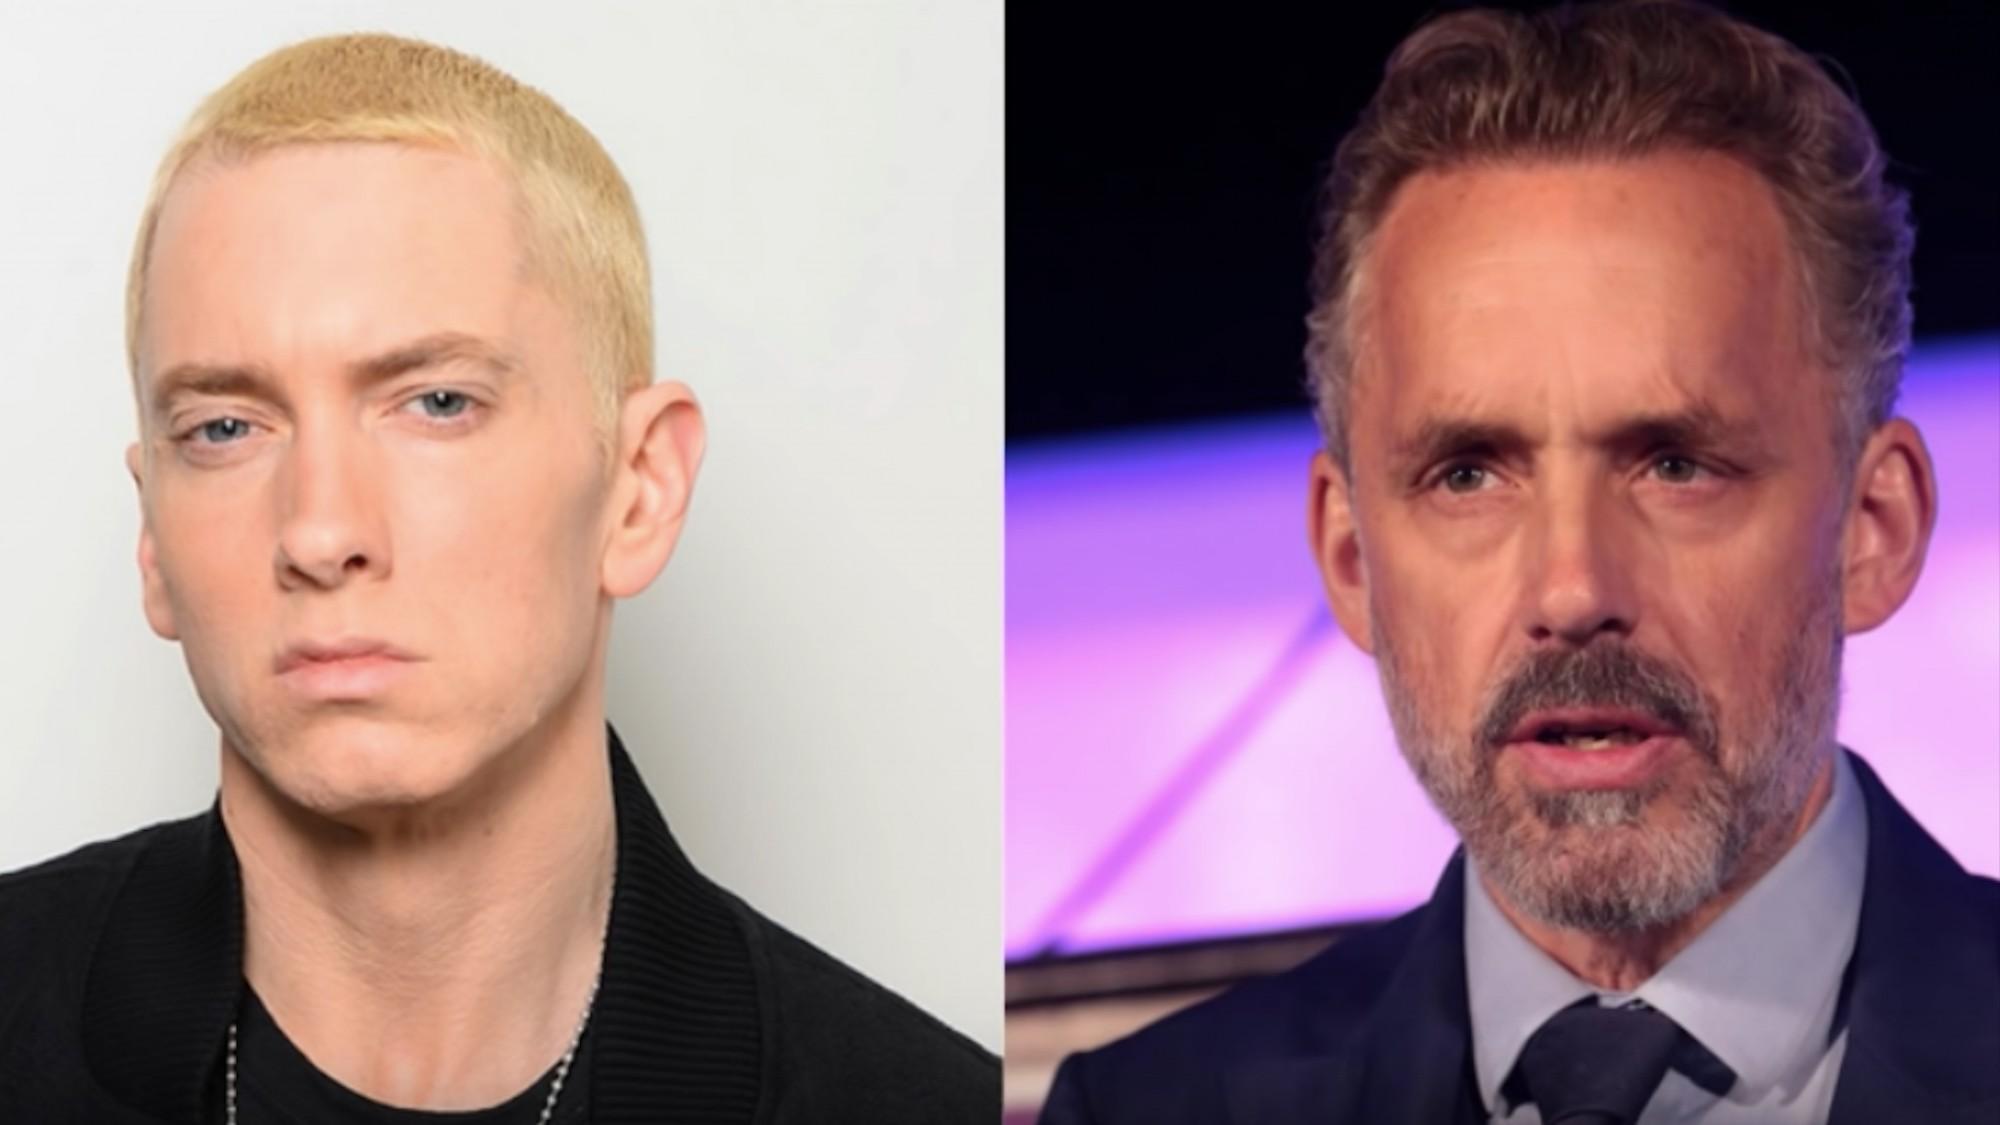 f5590ce06ac Machine Learning Can Make Jordan Peterson Rap Like Eminem - VICE